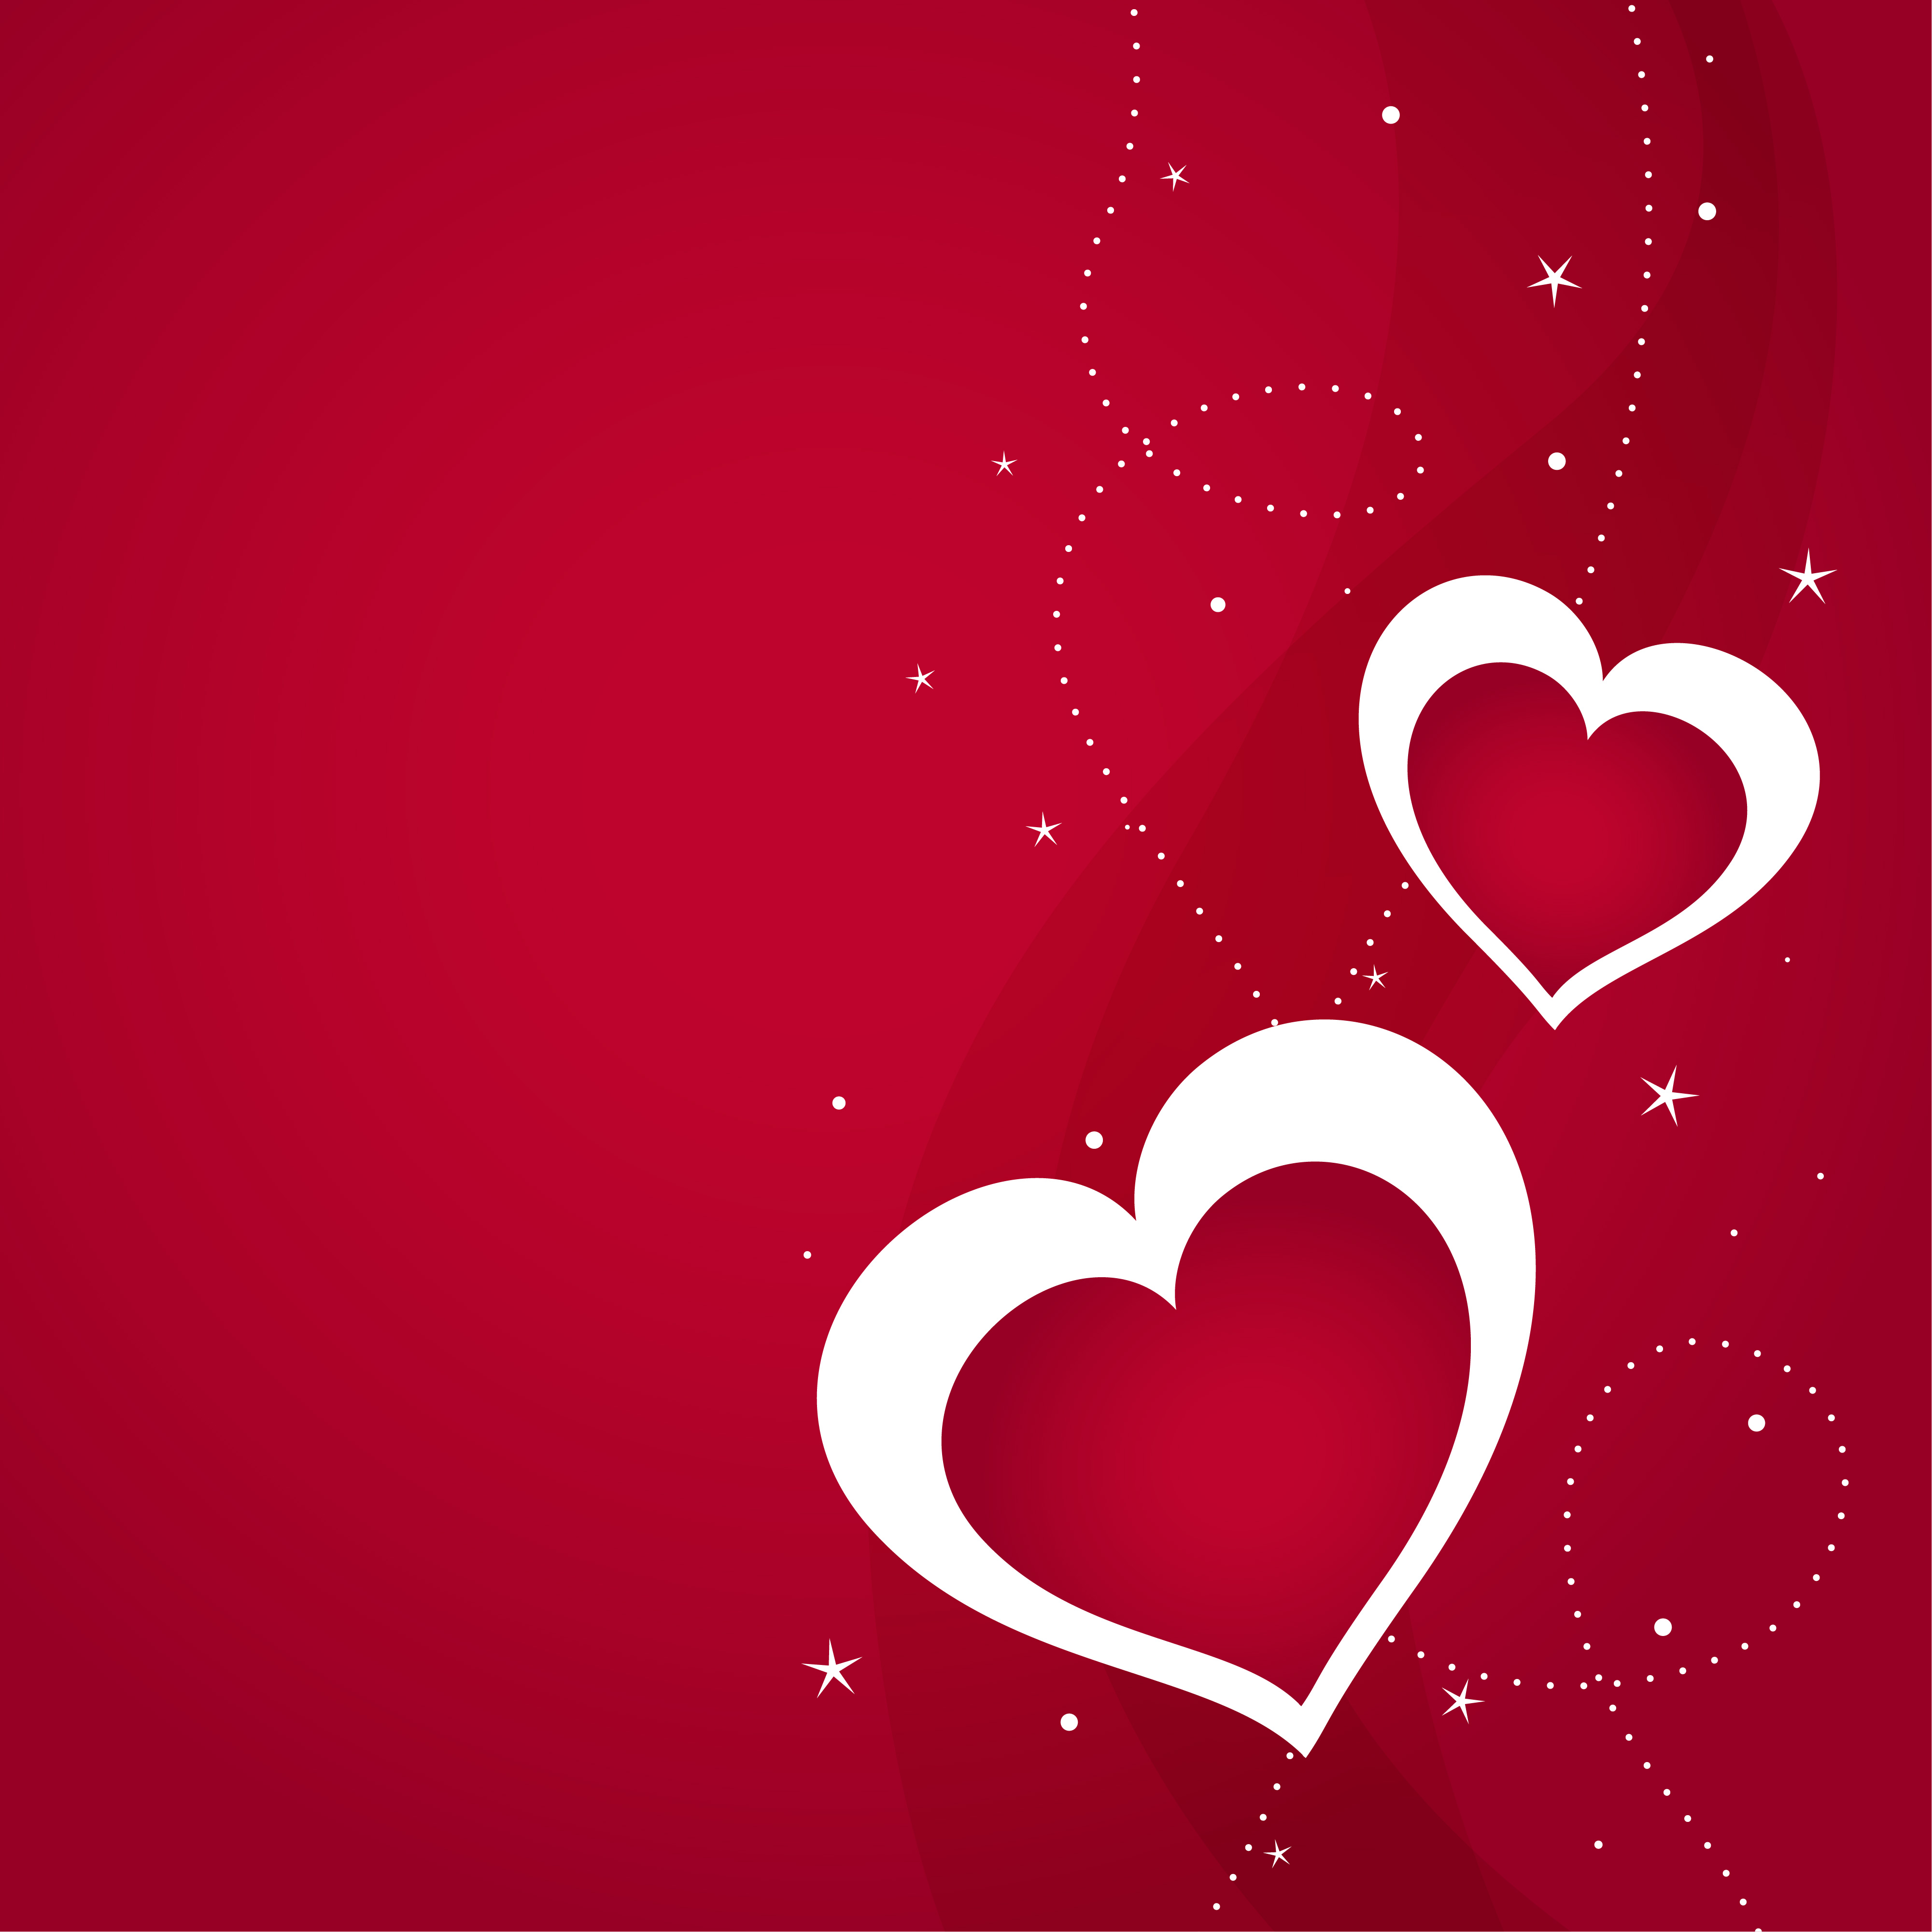 Valentines Day Wallpaper: Happy Valentines Day Greeting Background